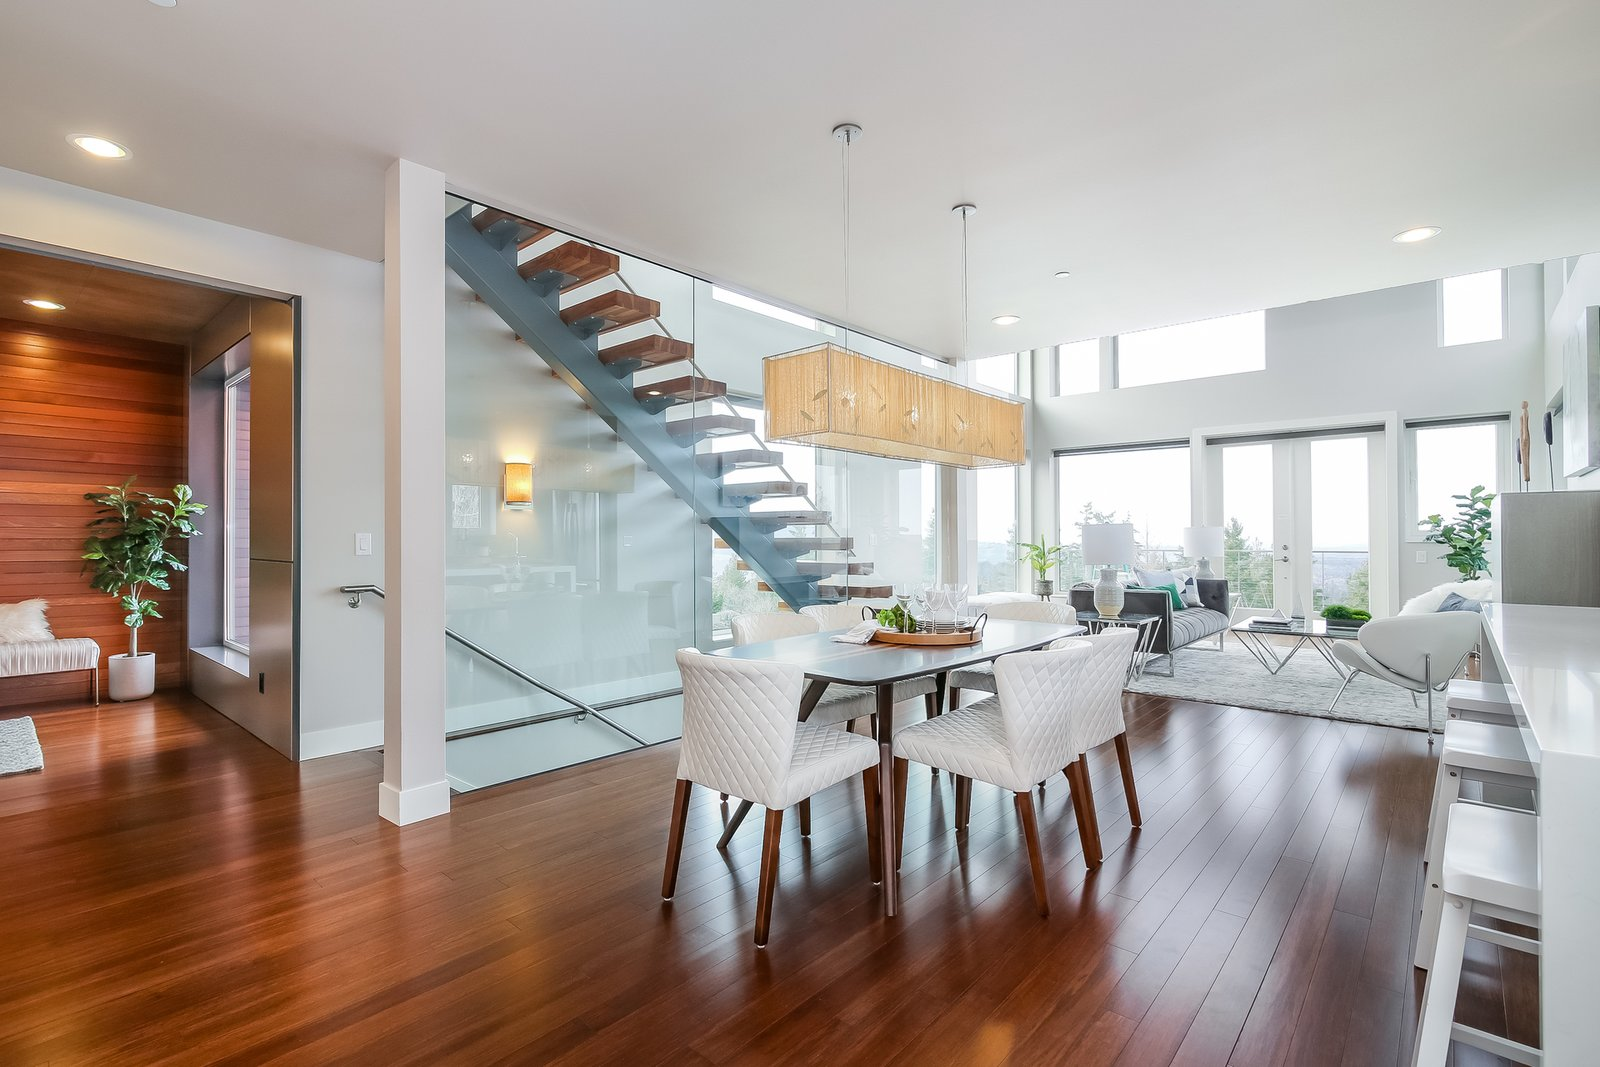 Dining Room, Medium Hardwood Floor, Chair, Bar, Ceiling Lighting, Table, Recessed Lighting, and Wall Lighting  Japanese Builder Ichijo Creates Net-Zero Energy Home by PlanOmatic